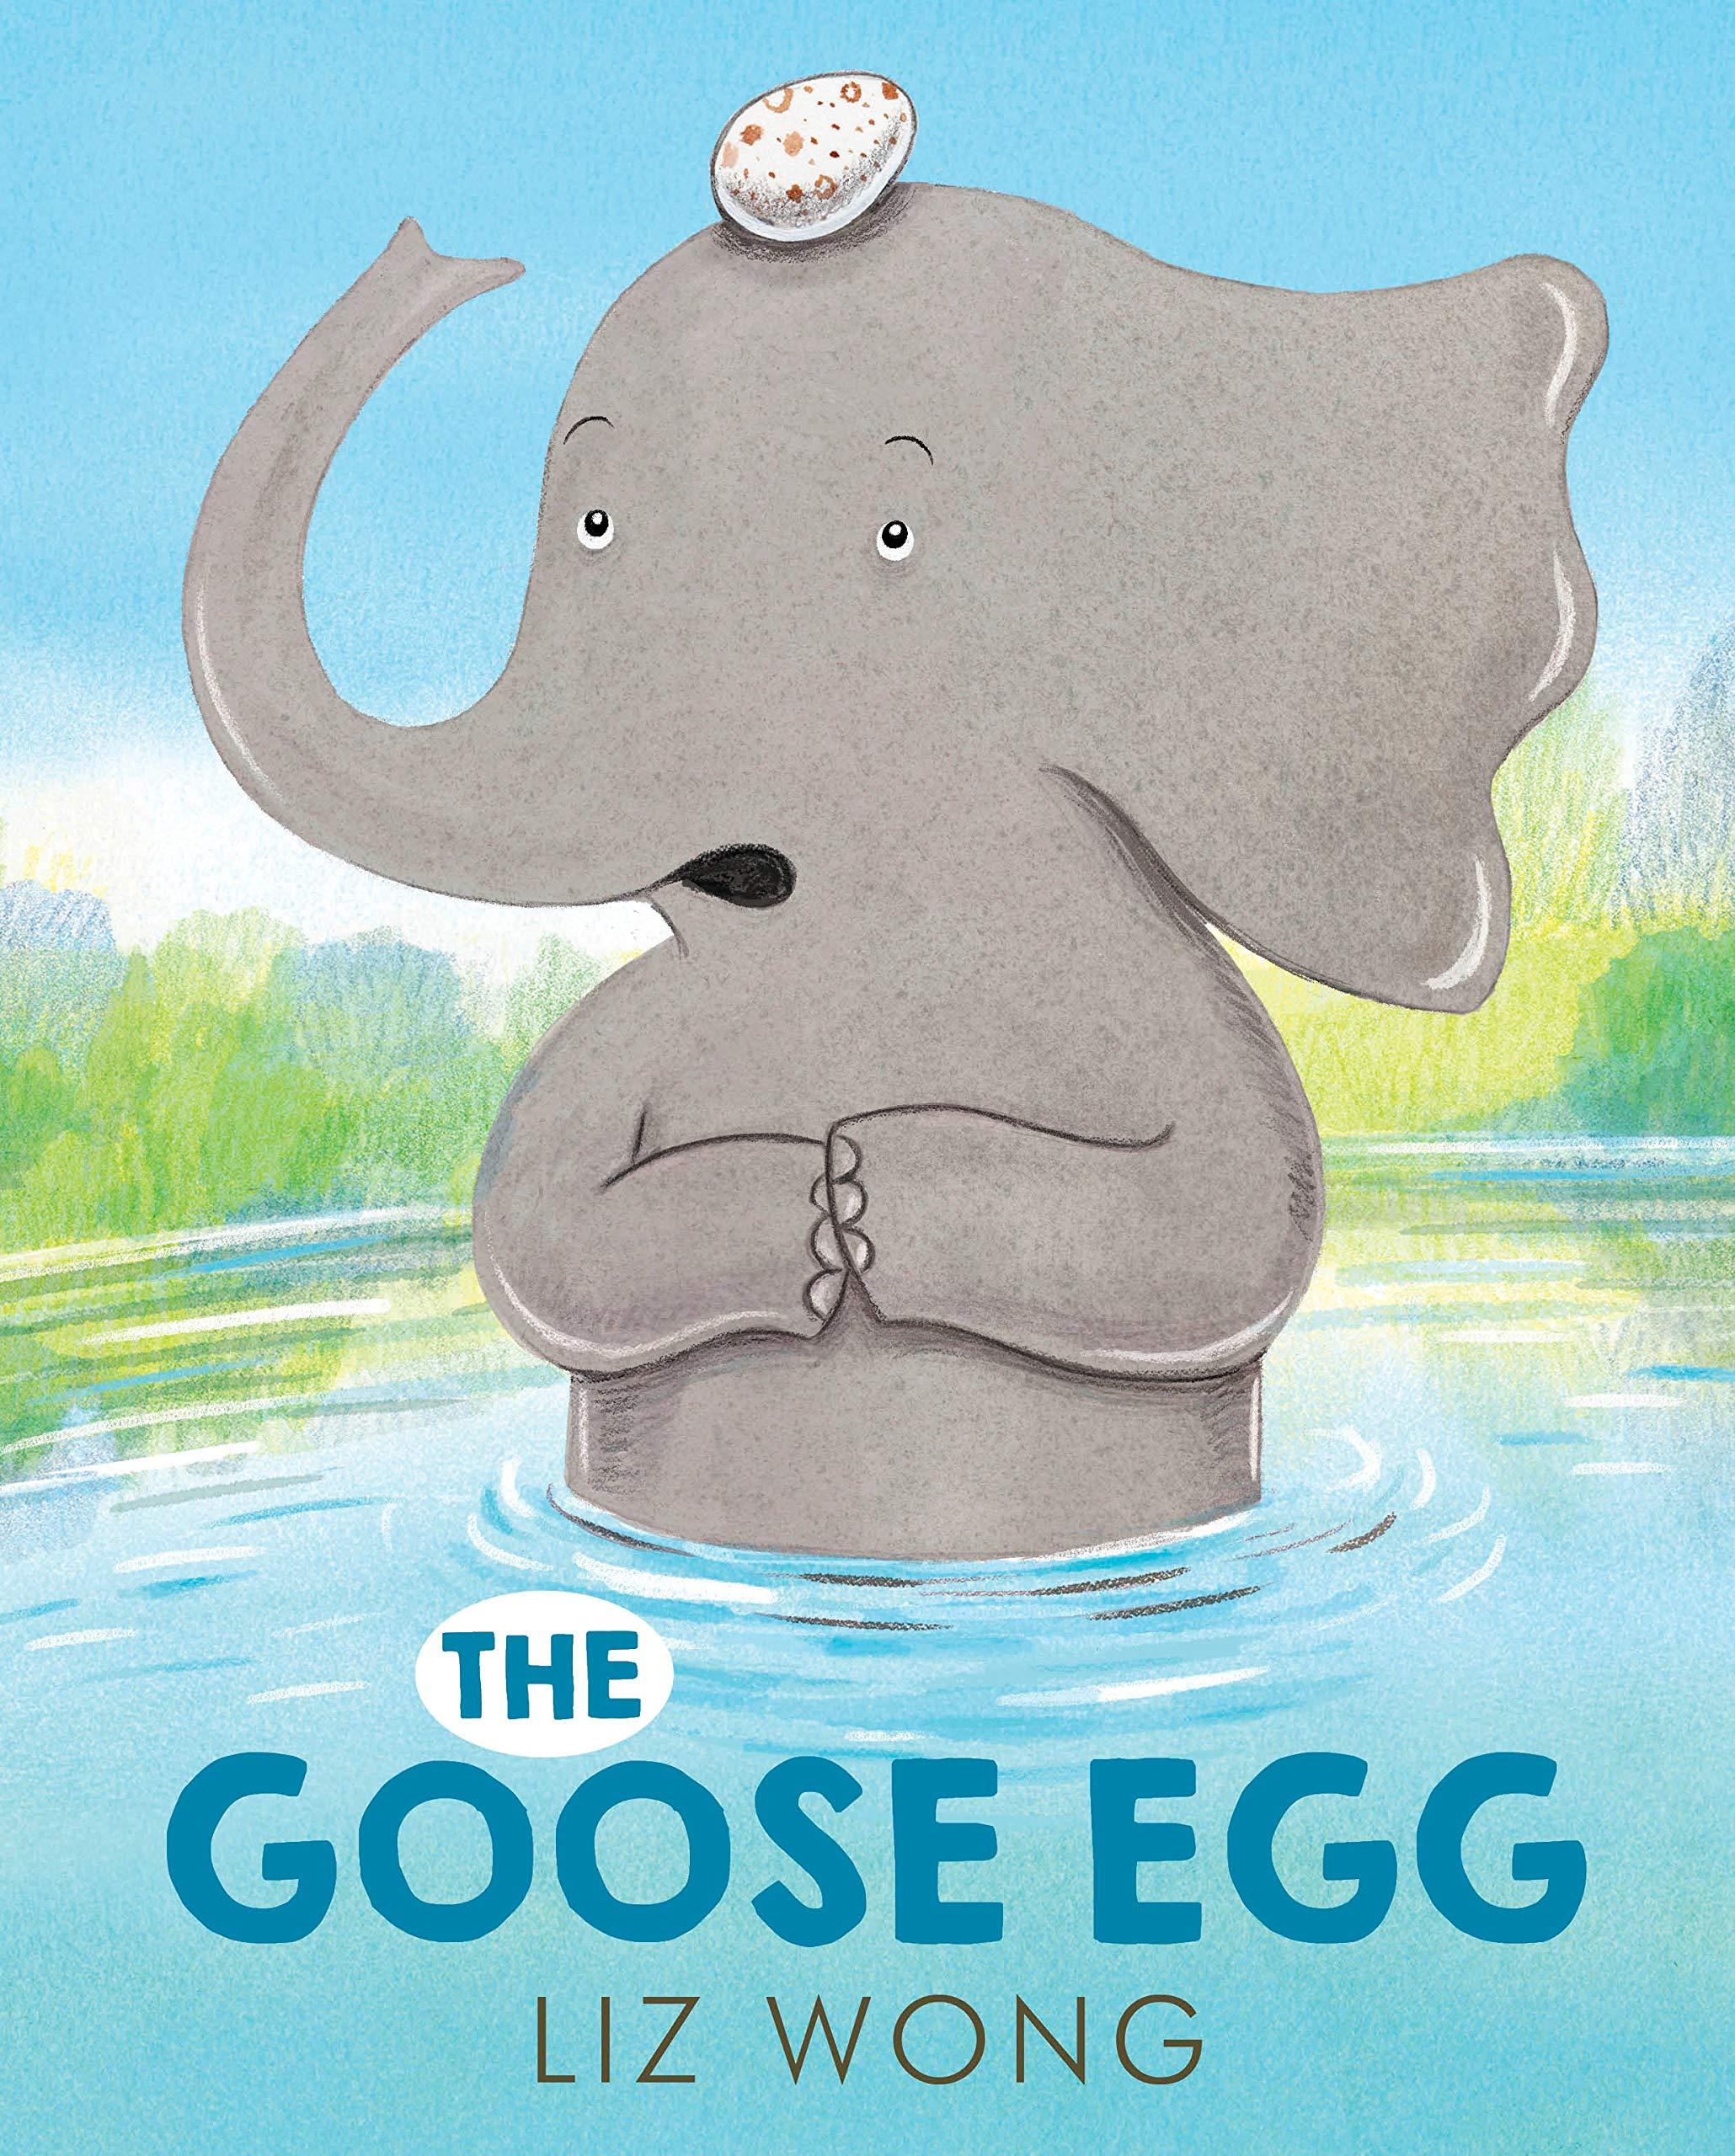 BOOKWORM The Goose Egg.jpg